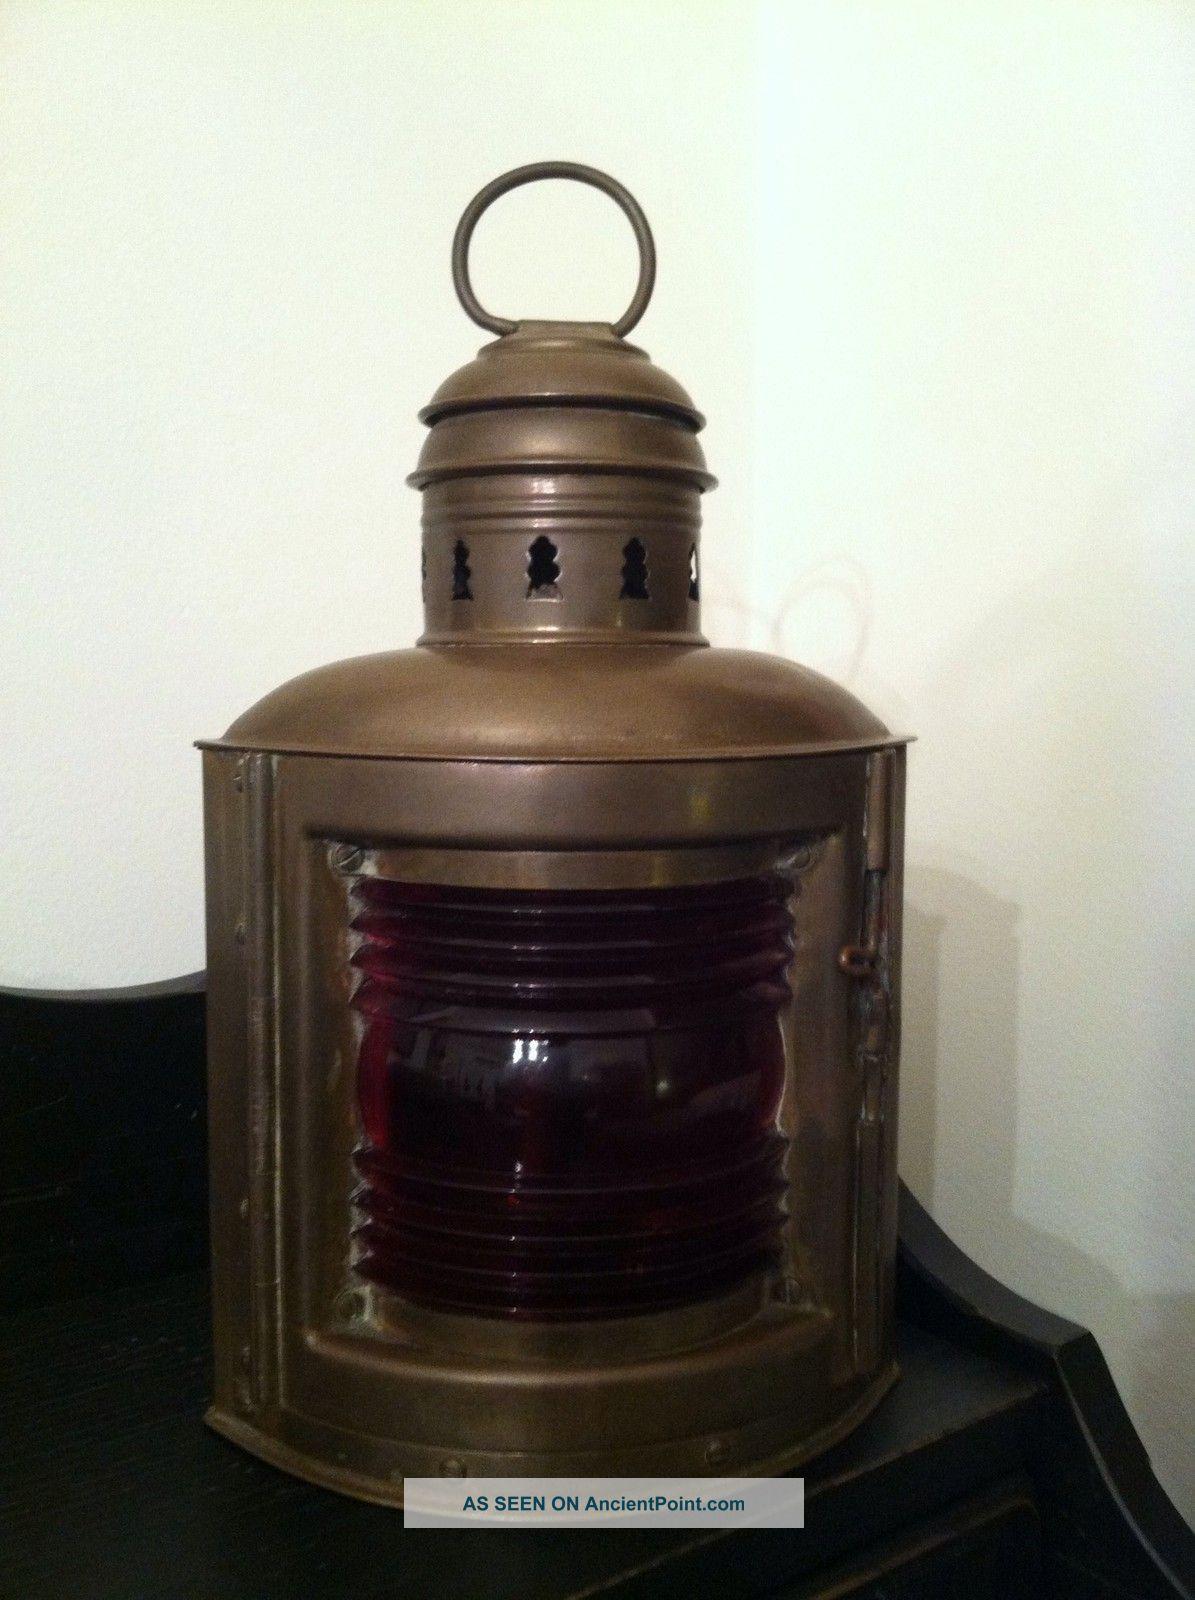 Ships Lantern Wall Lights : Vintage Brass Ship Lantern Antique Nautical Brass Ship Lamp Boat Red Navigation Lamps & Lighting ...